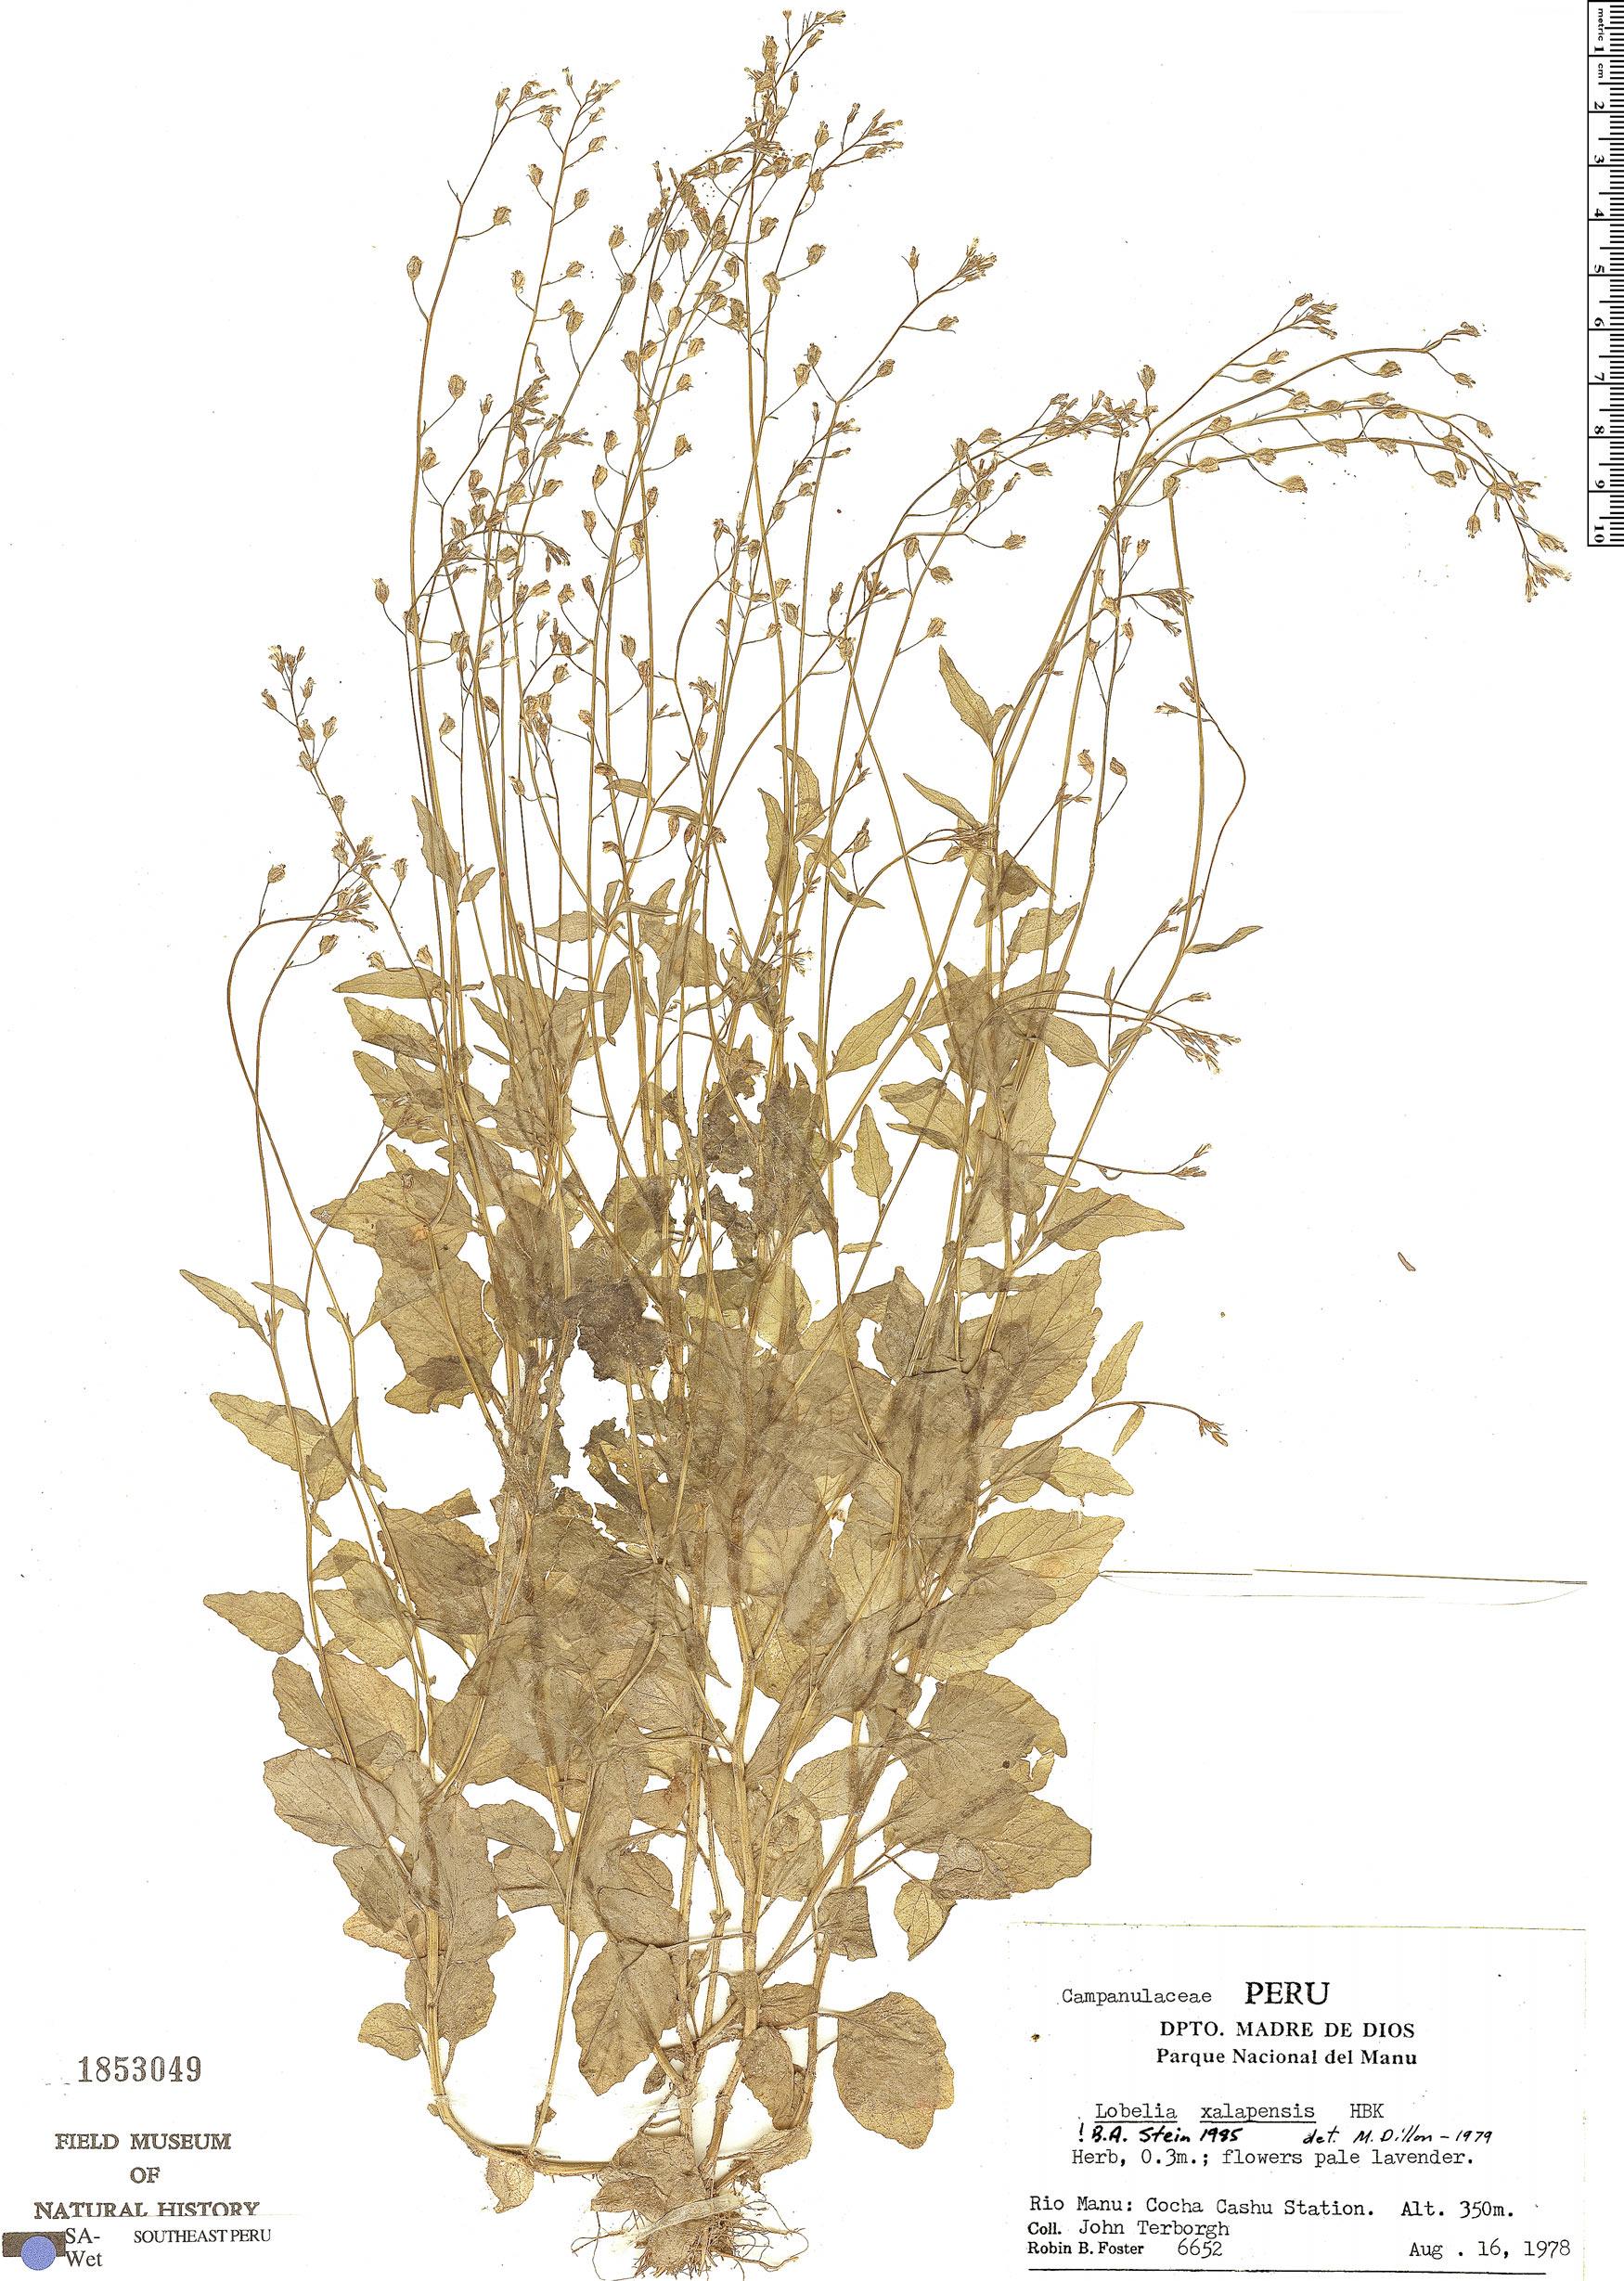 Specimen: Lobelia xalapensis